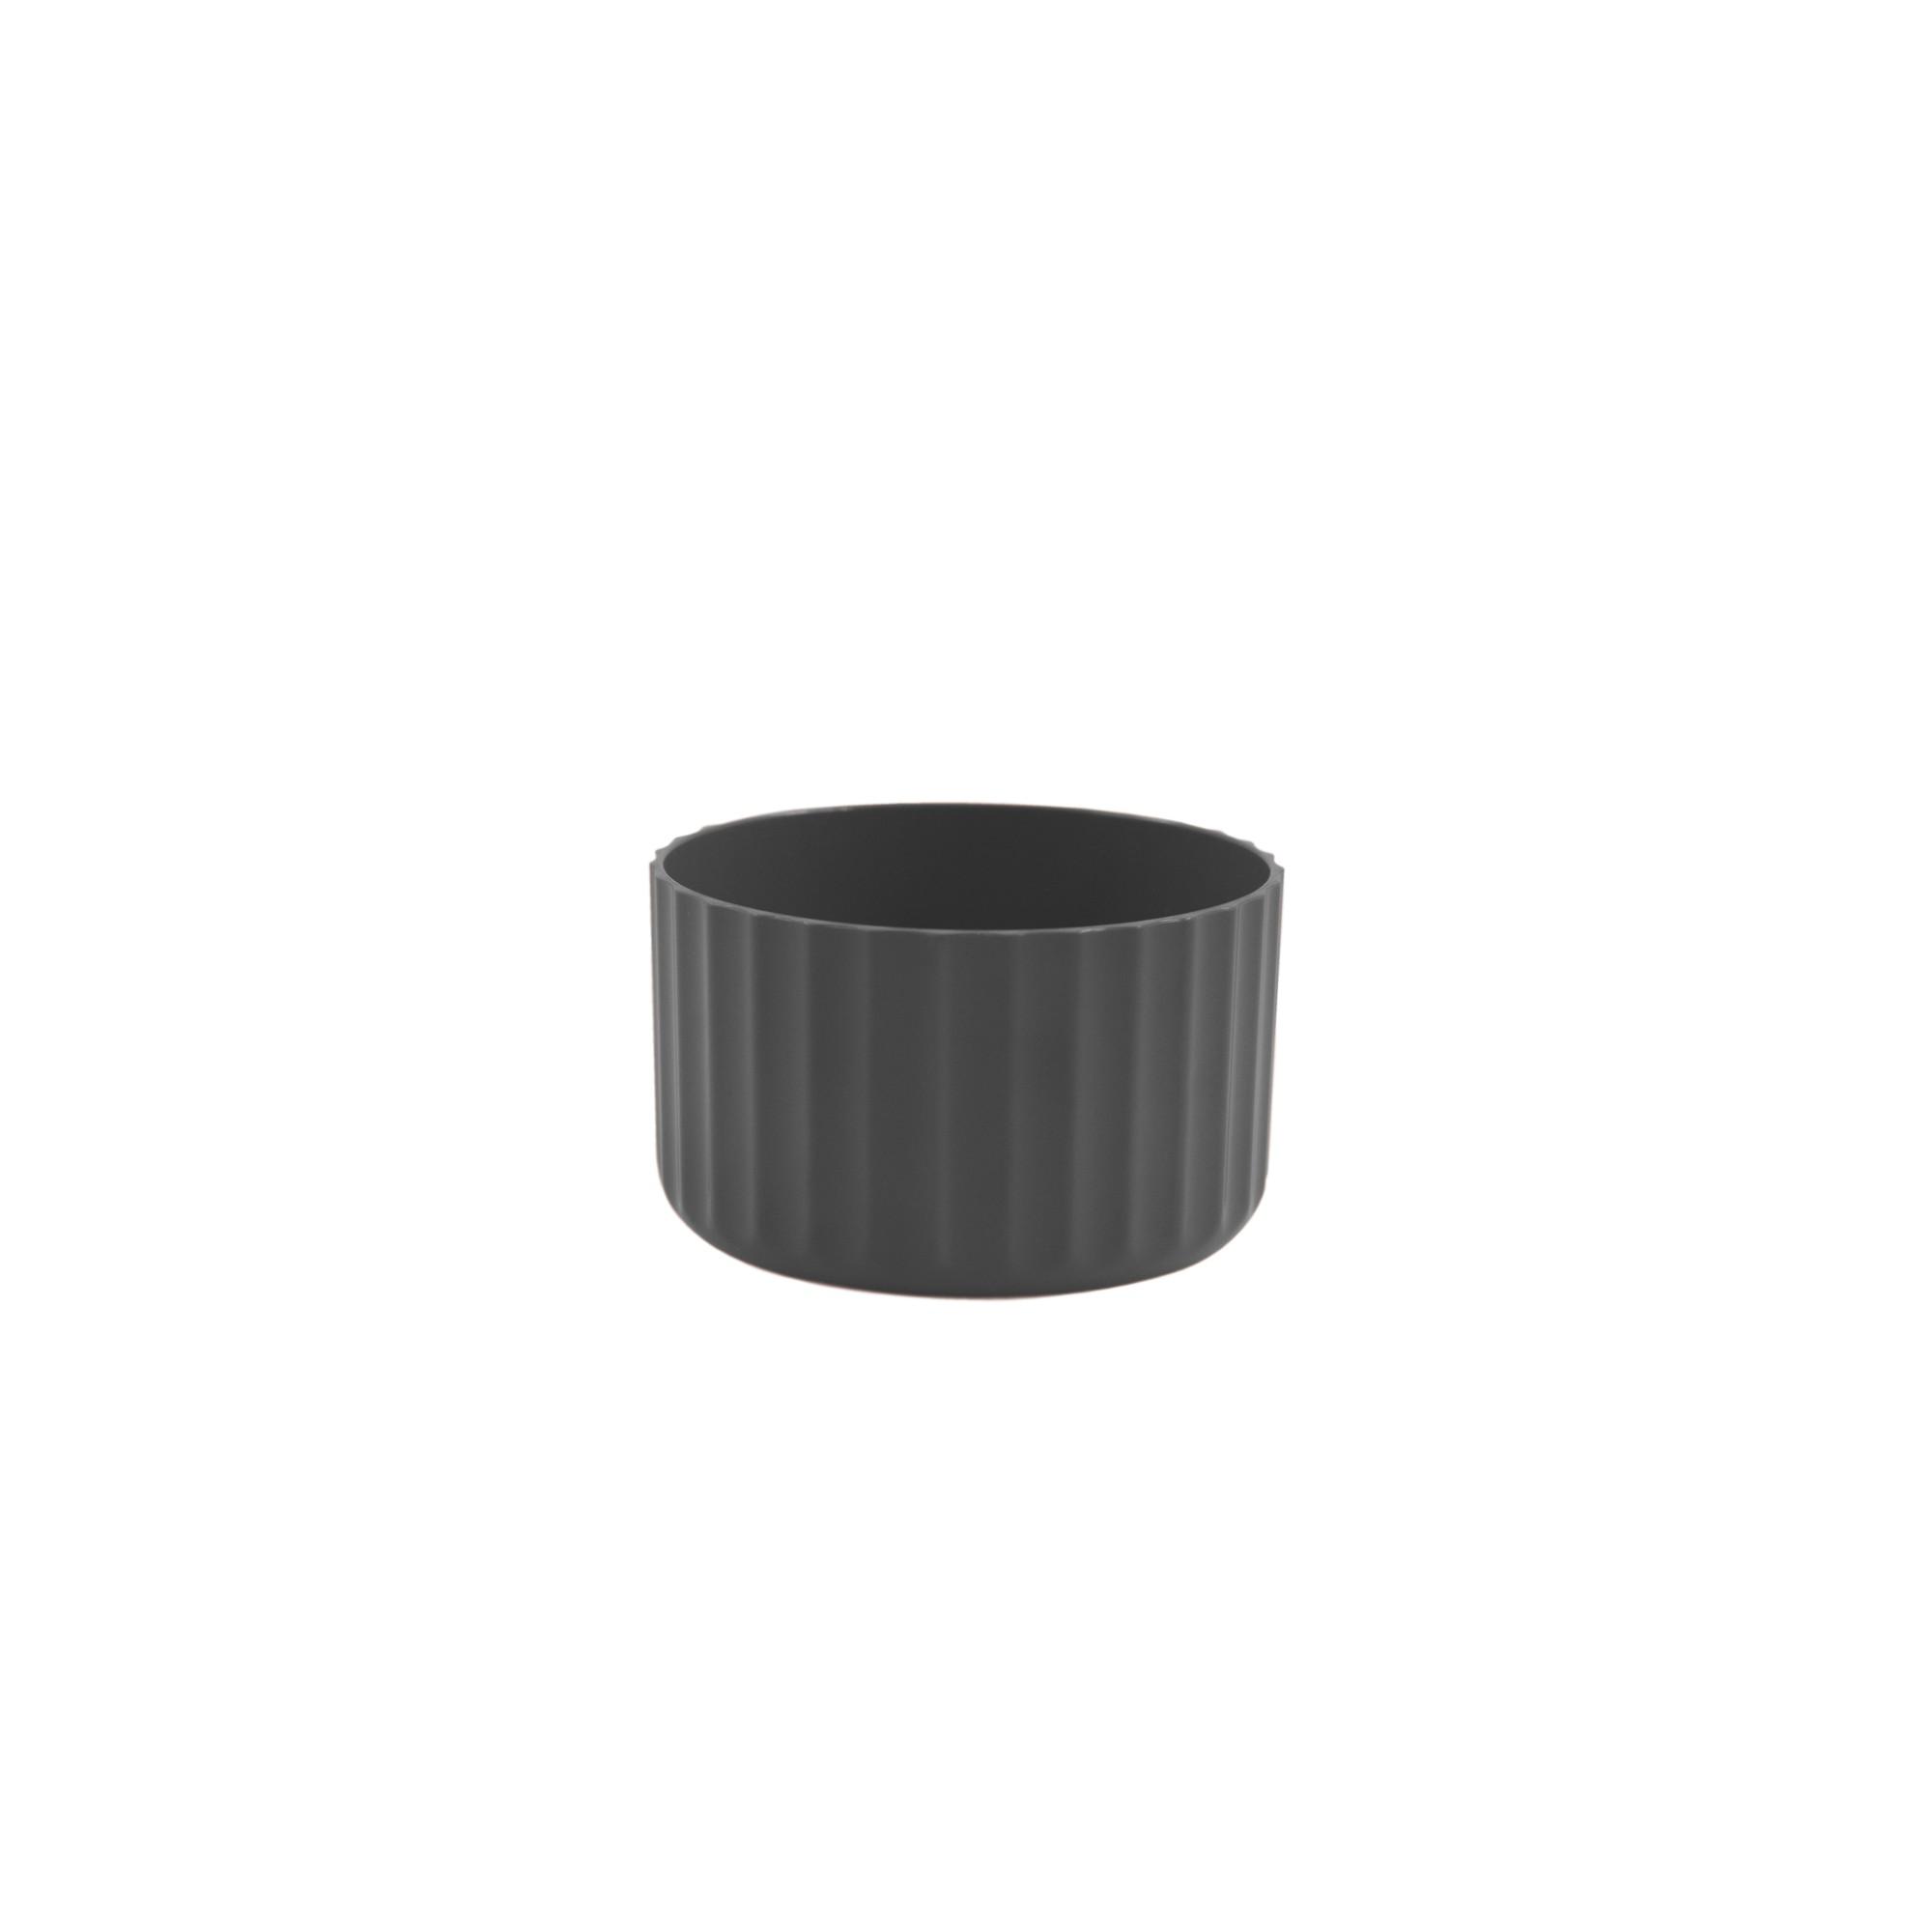 Vaso para Plantas Plastico 6x996 cm Redondo Chumbo - Ou